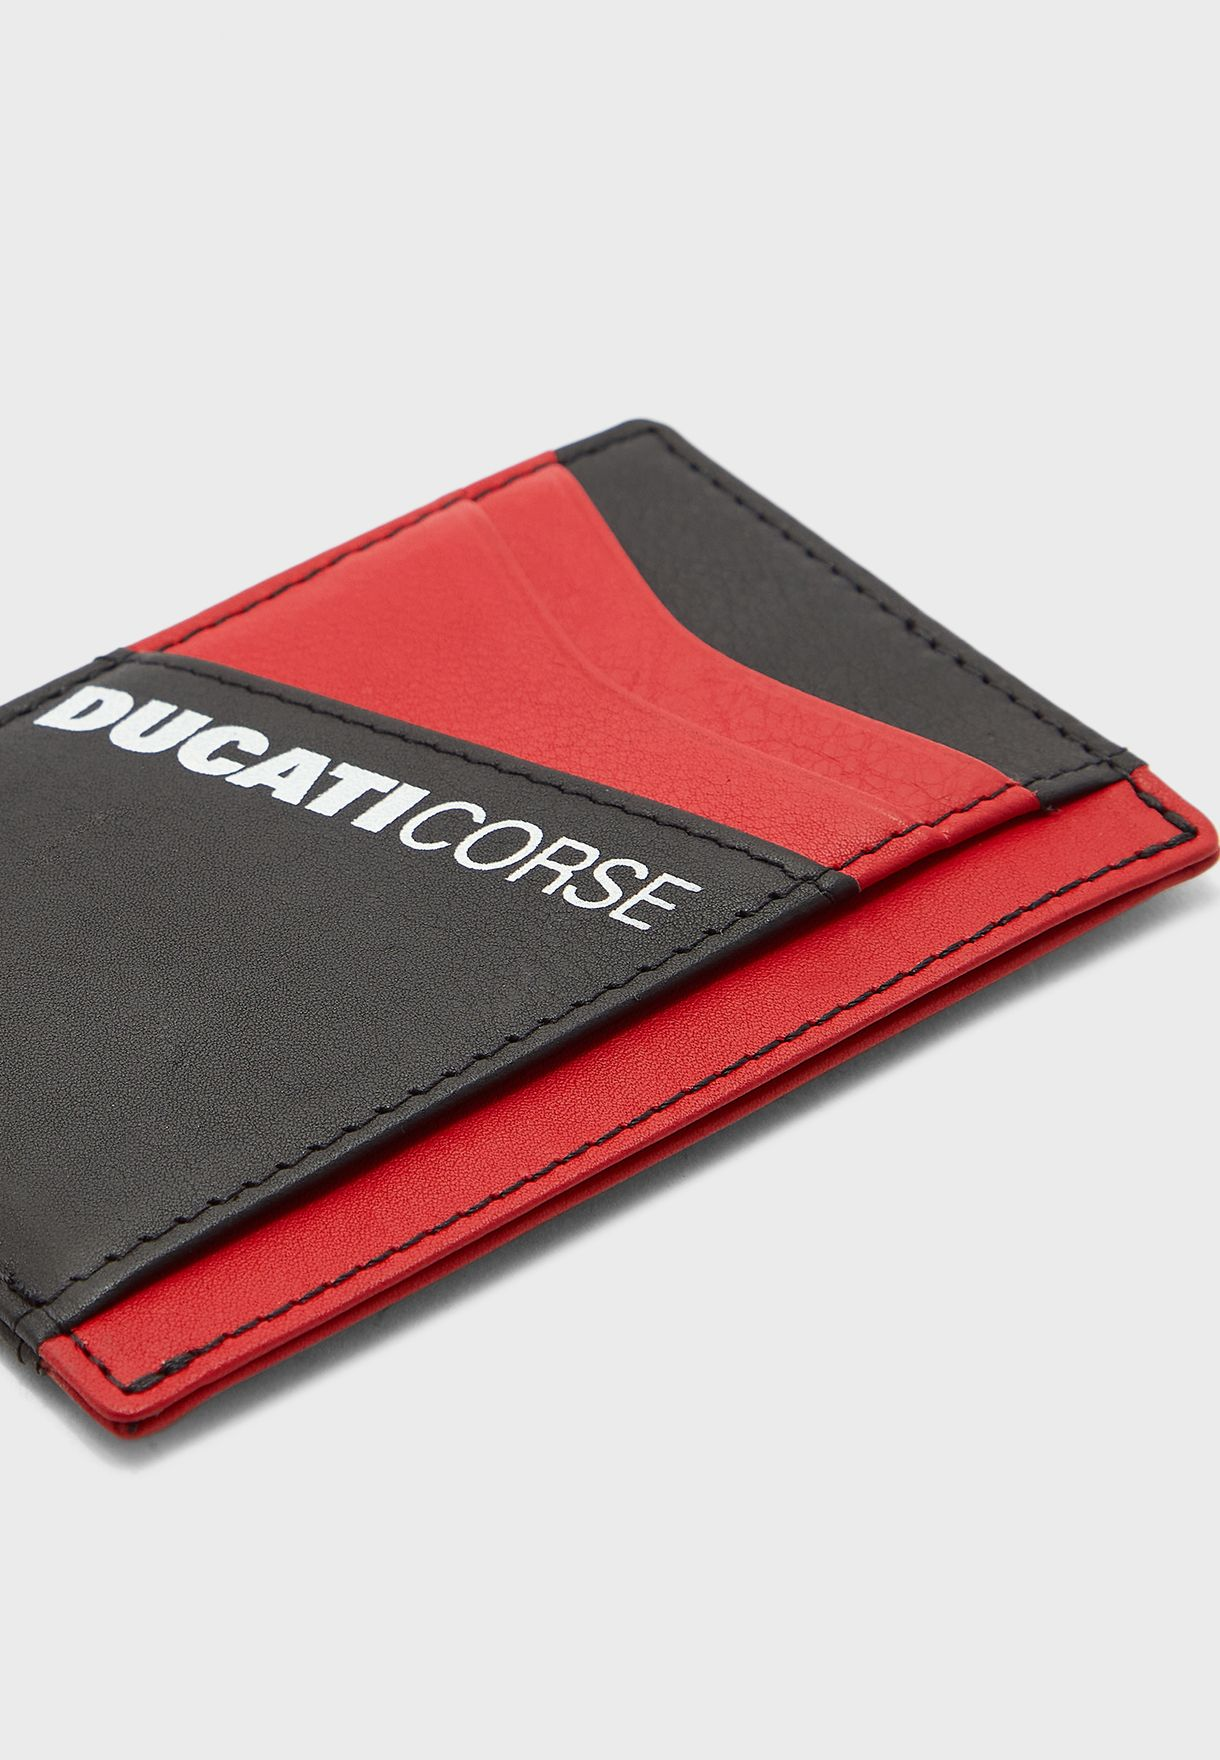 Modena Card Holder